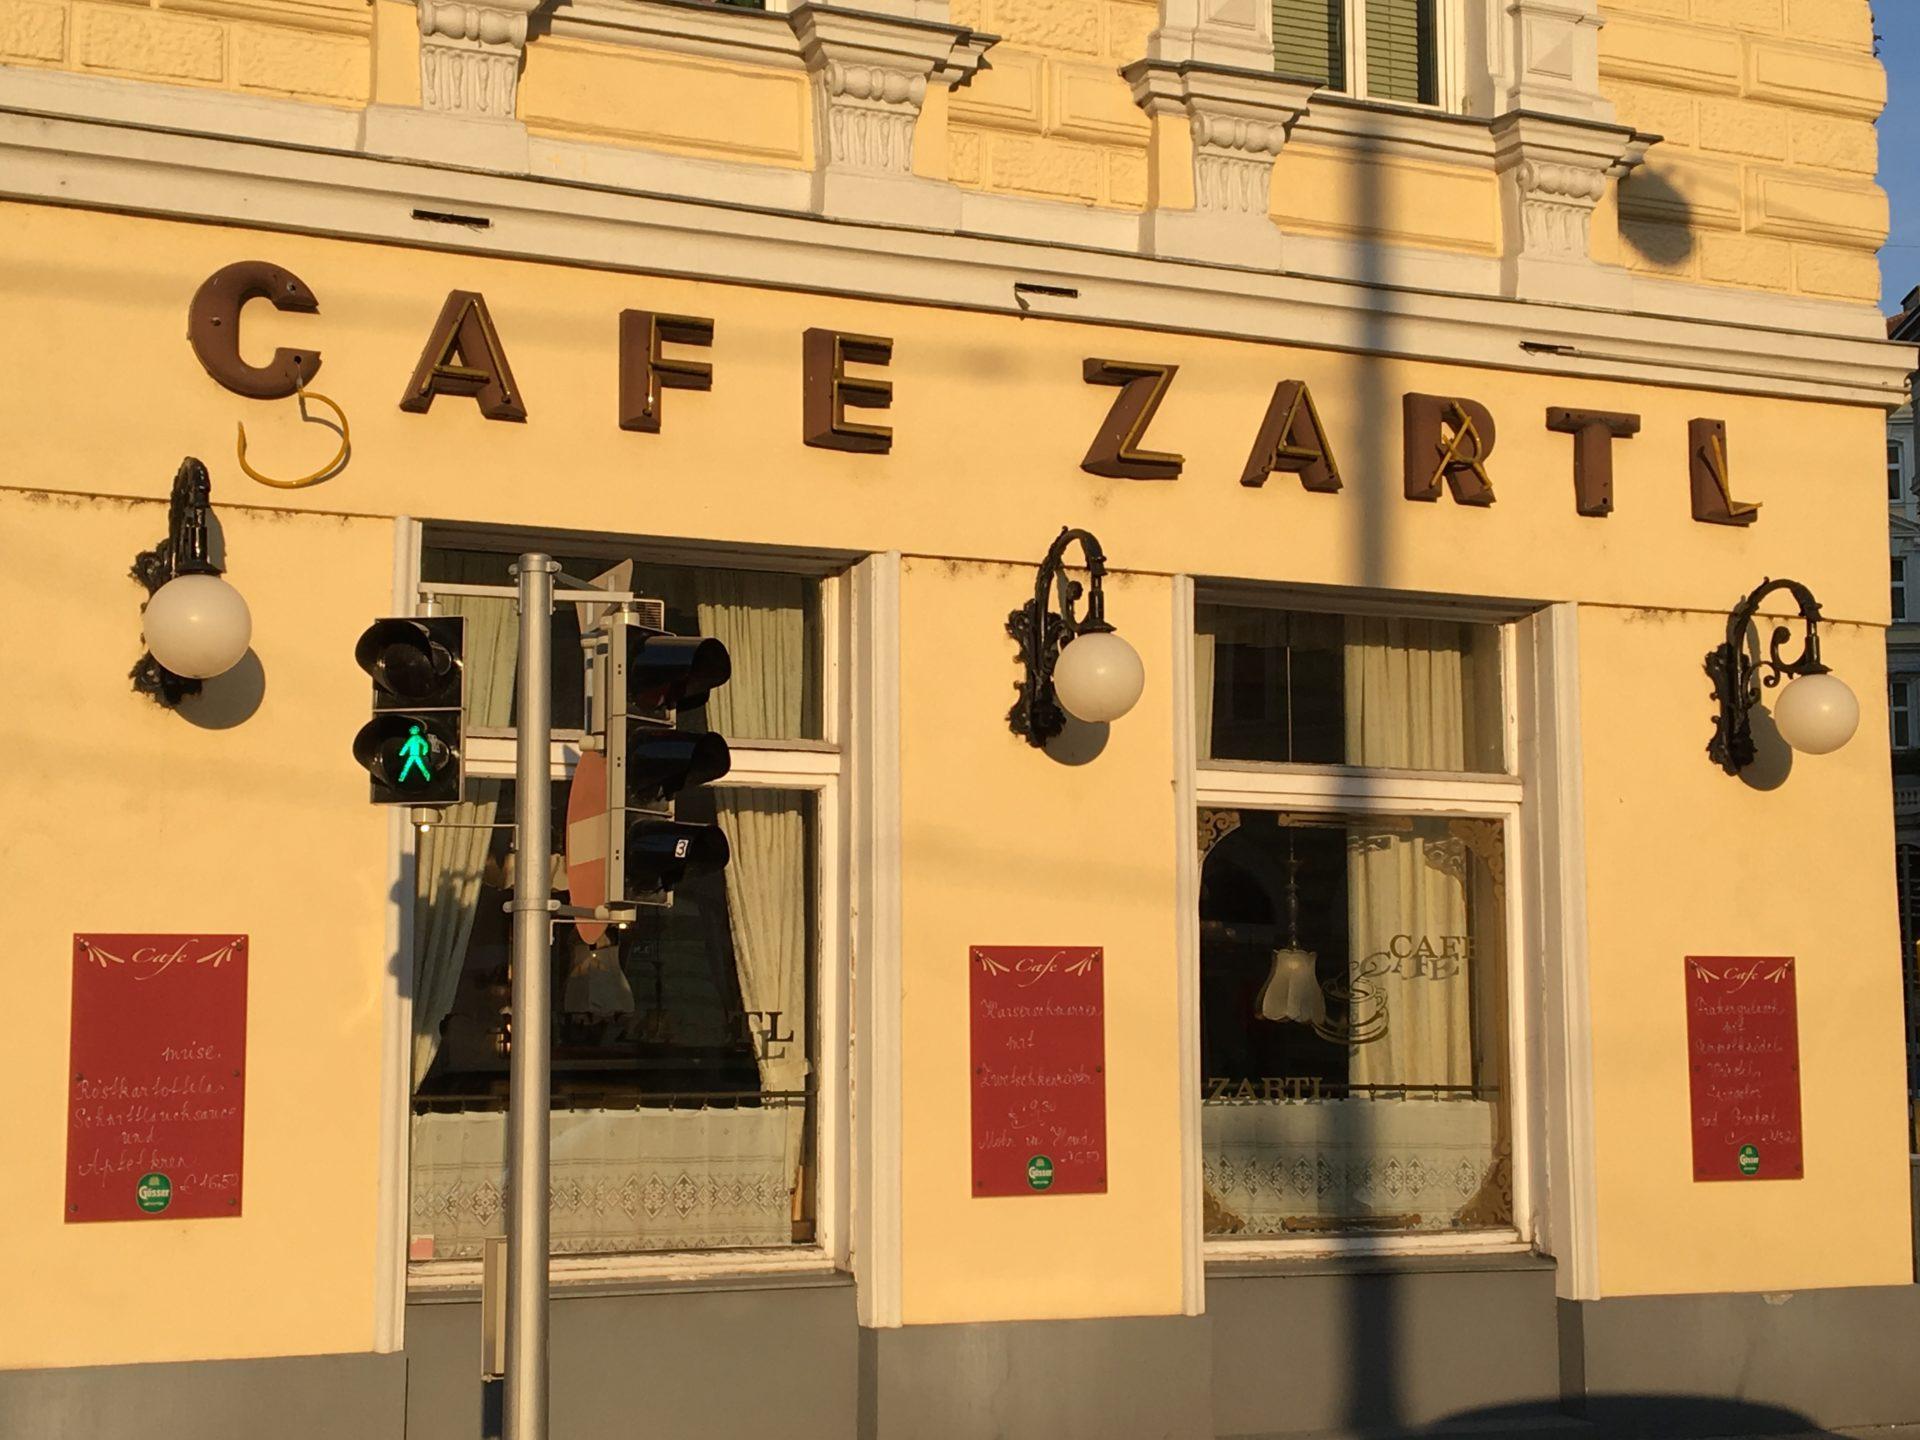 Cafe Zartl Vienna Austria